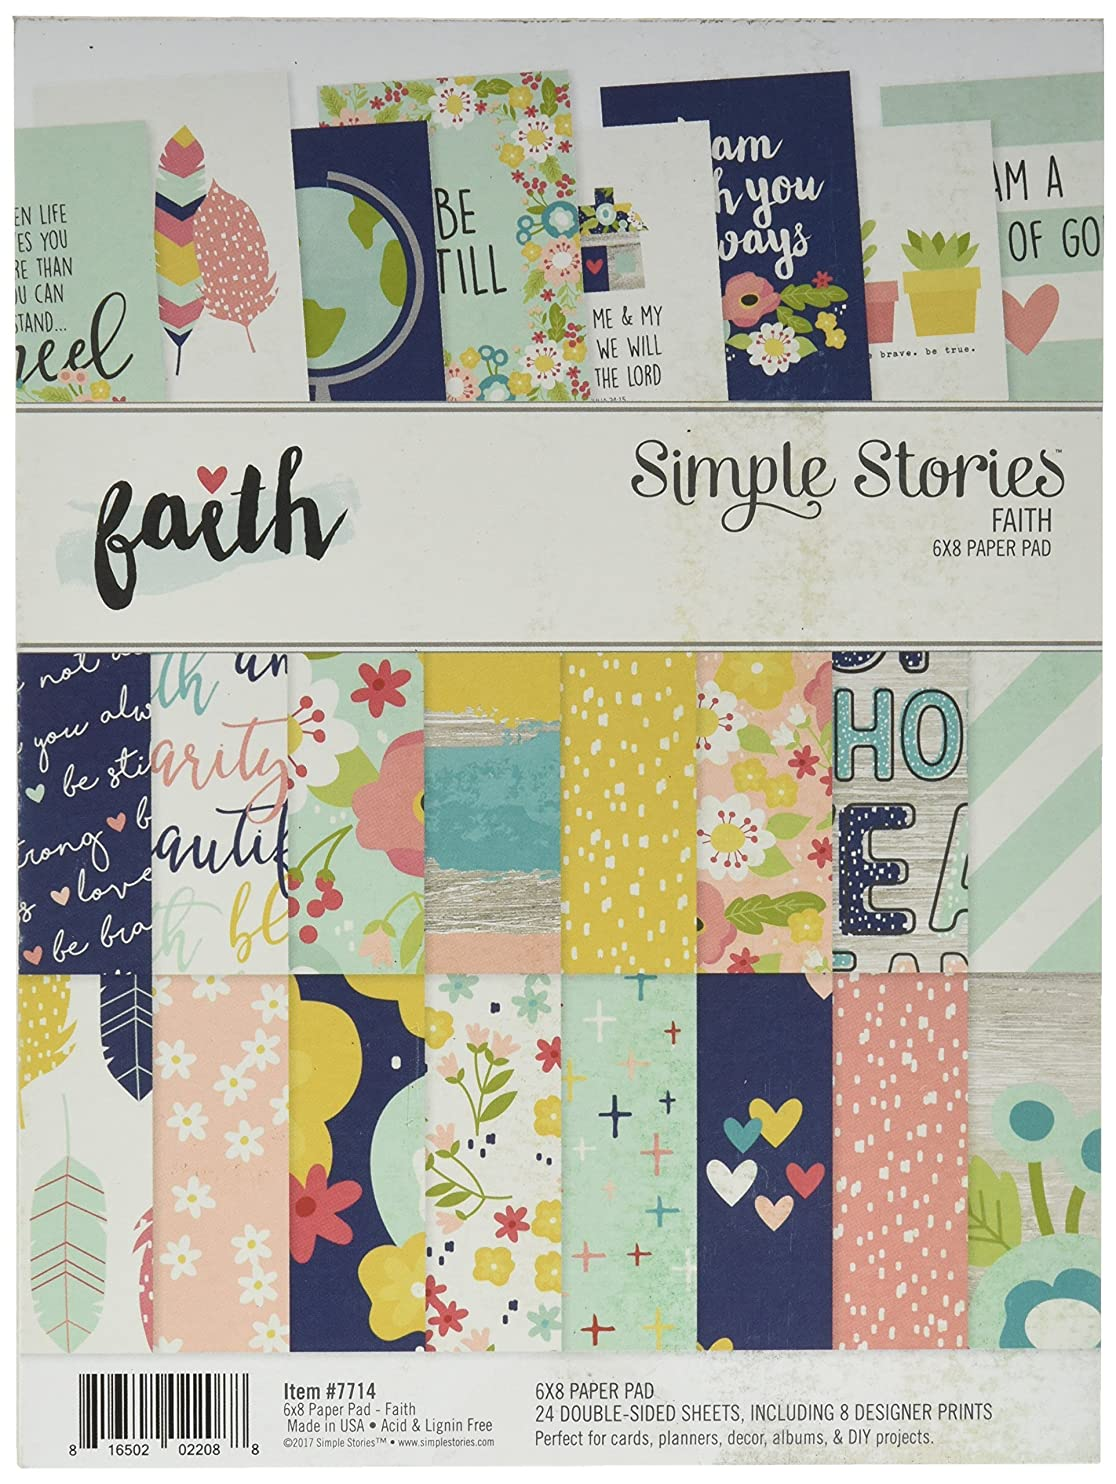 Simple Stories Faith 6x8 Paper Pad